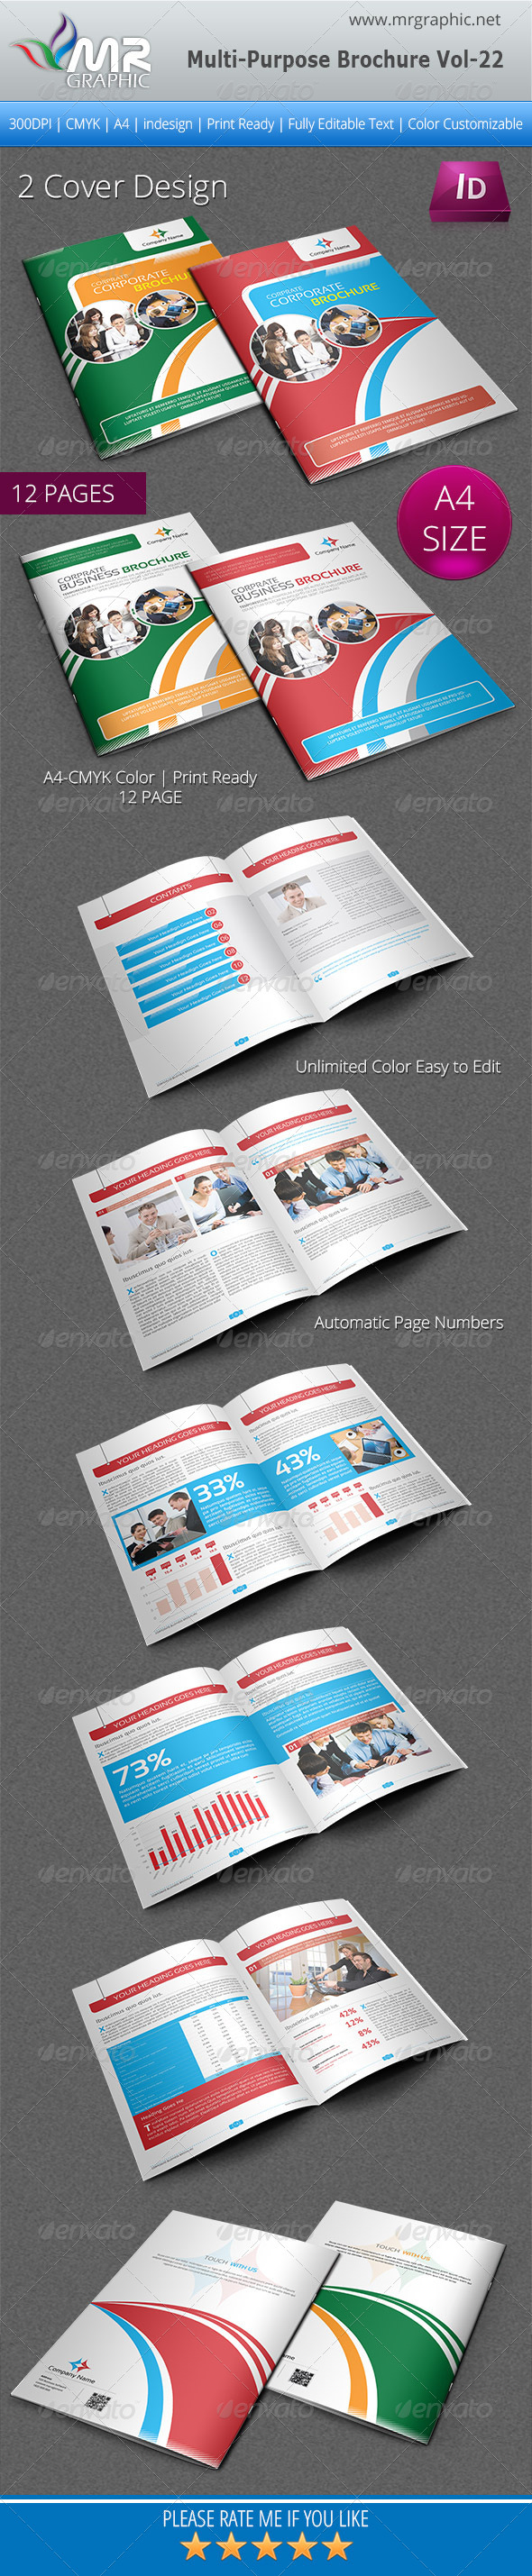 GraphicRiver Multipurpose Business Brochure Template Vol-22 4859713